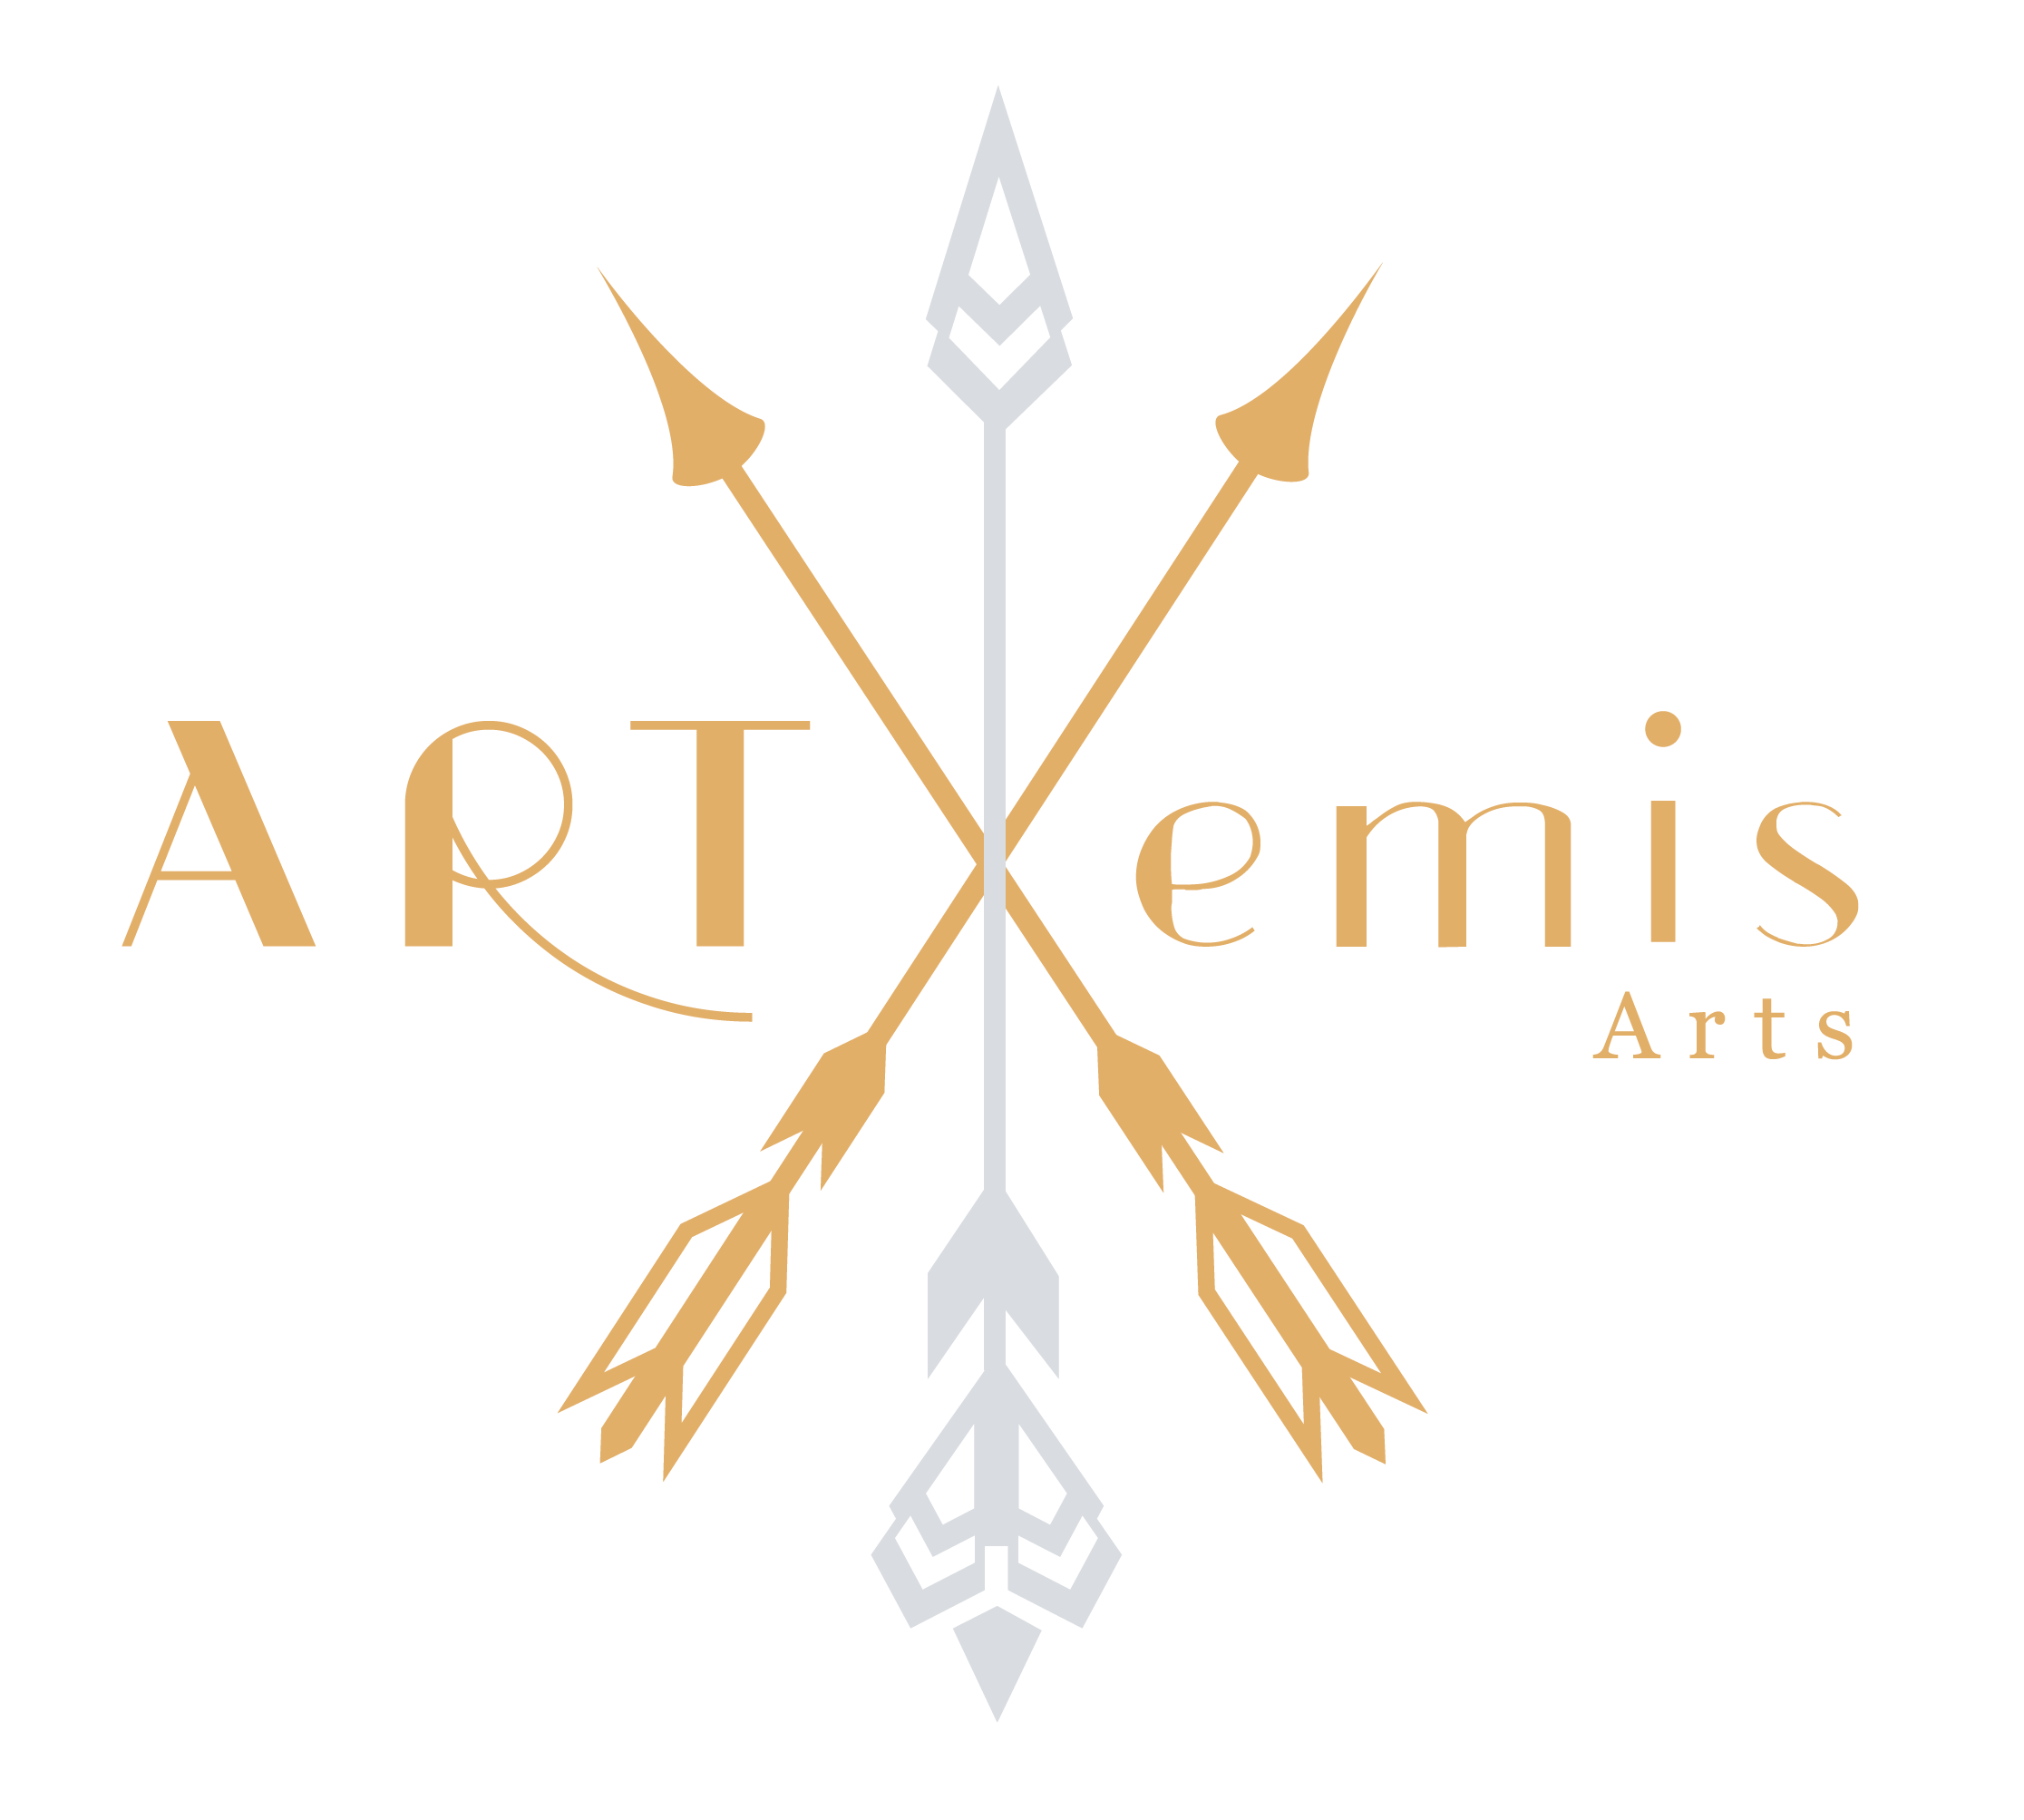 Artemis Arts Advancing The Woman Artist Through Knowledge